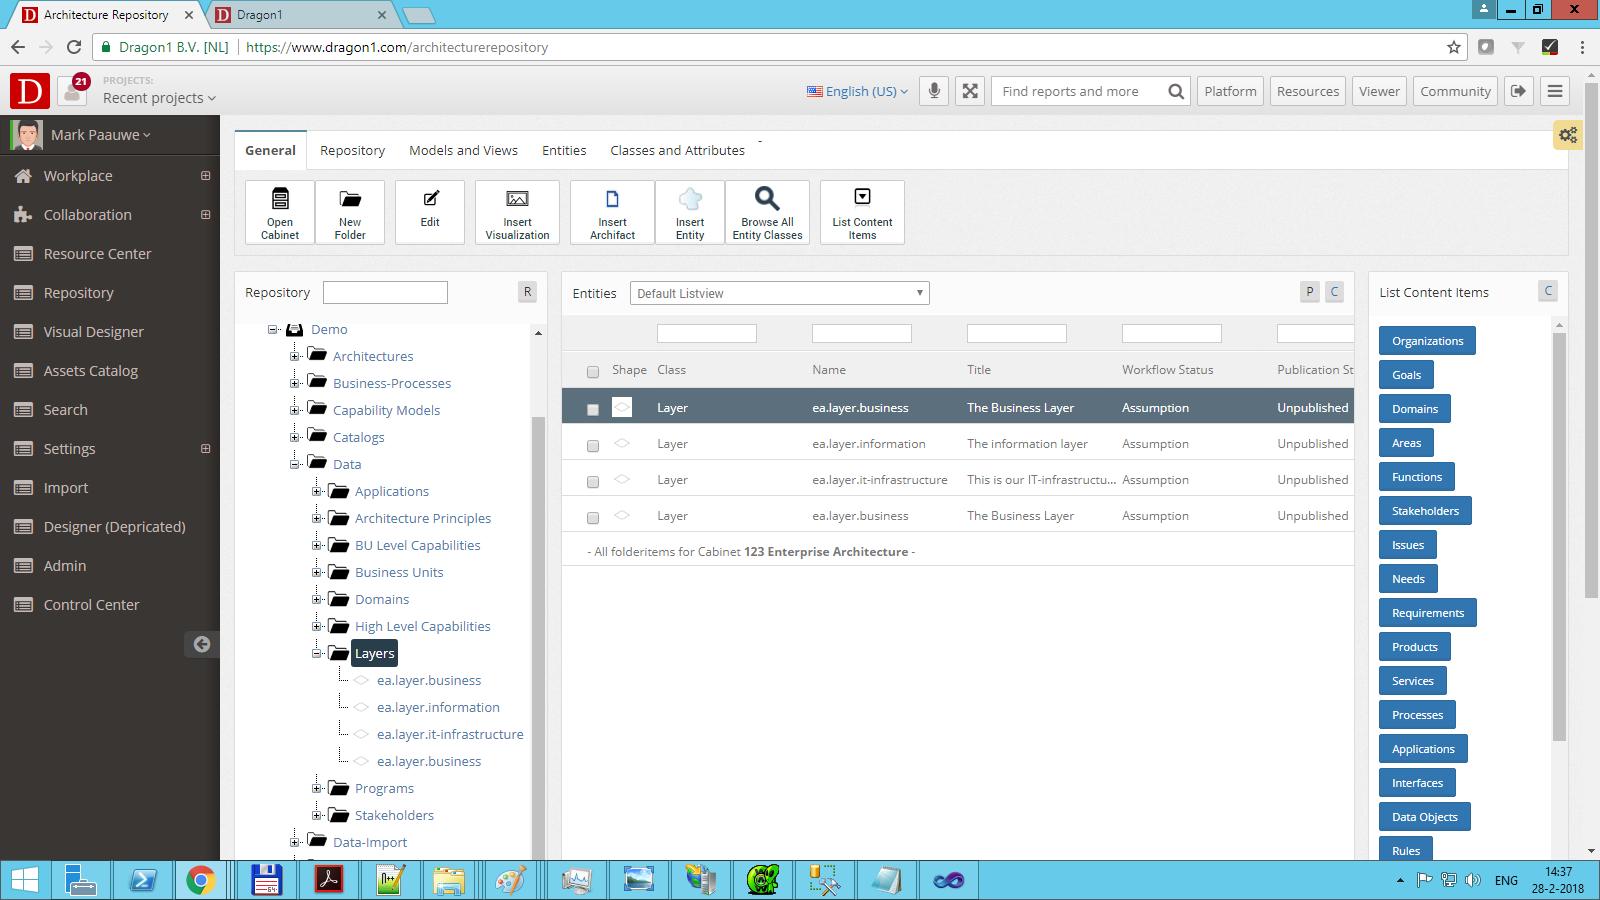 dragon1 change publication status architecture layer